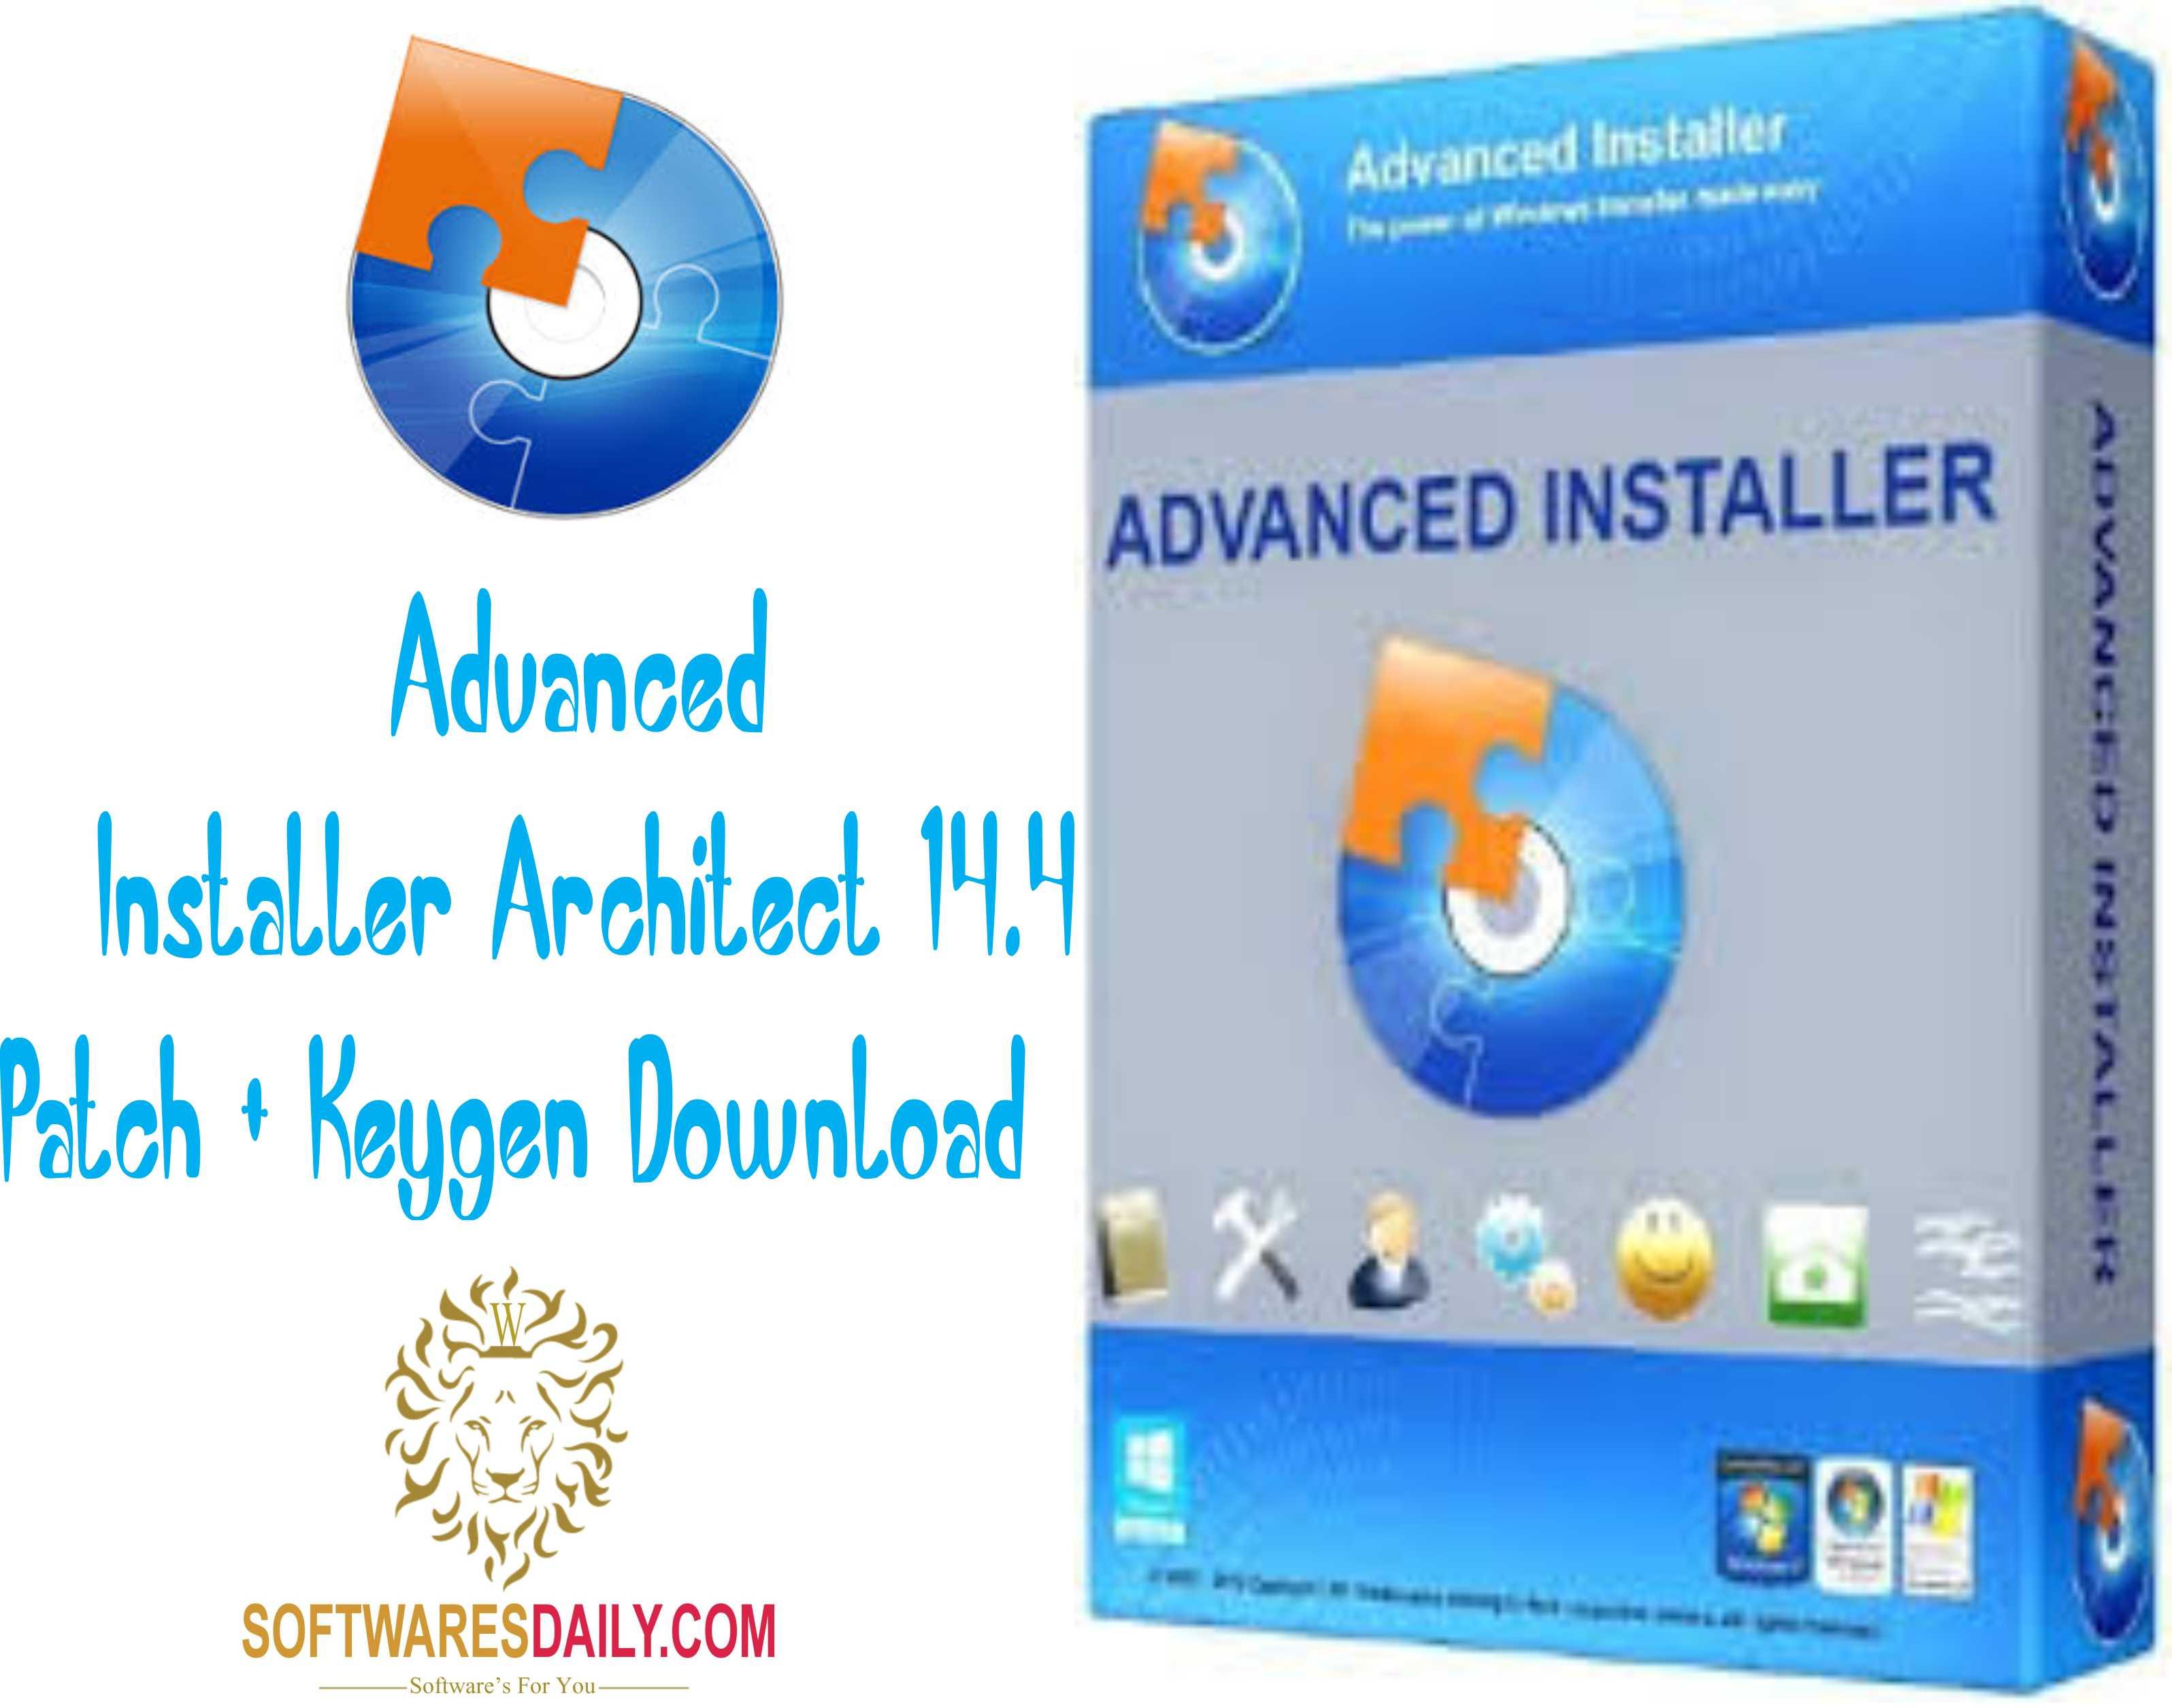 Advanced Installer Architect 16 3 Patch + Keygen Download